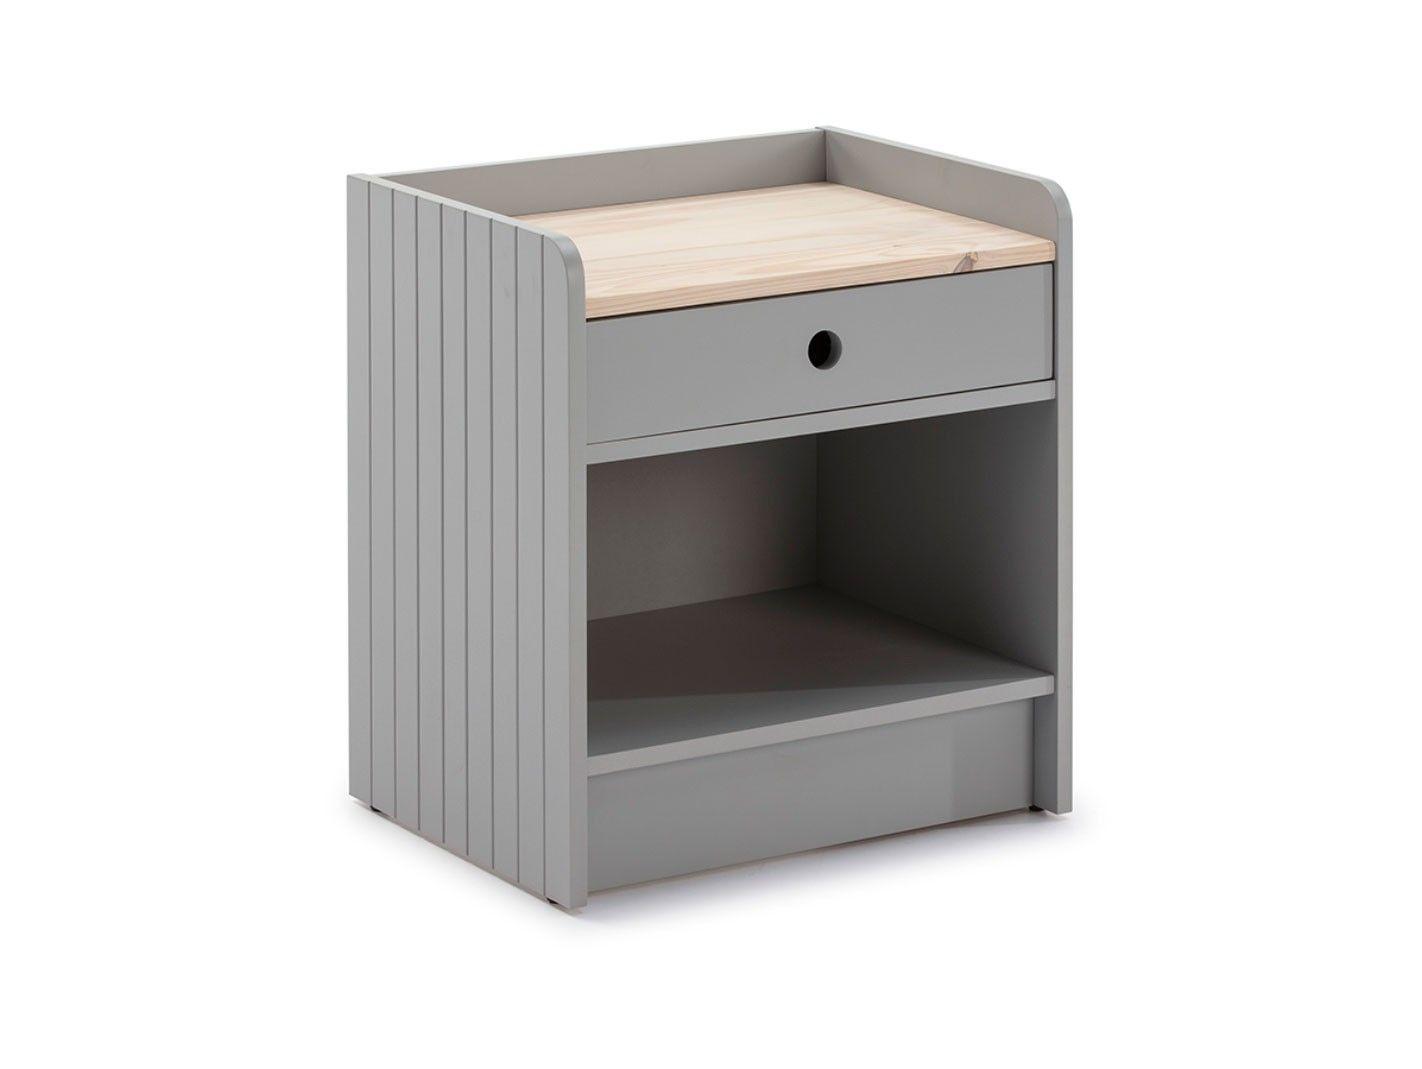 Dormitorio juvenil cama abatible for Muebles juveniles merkamueble